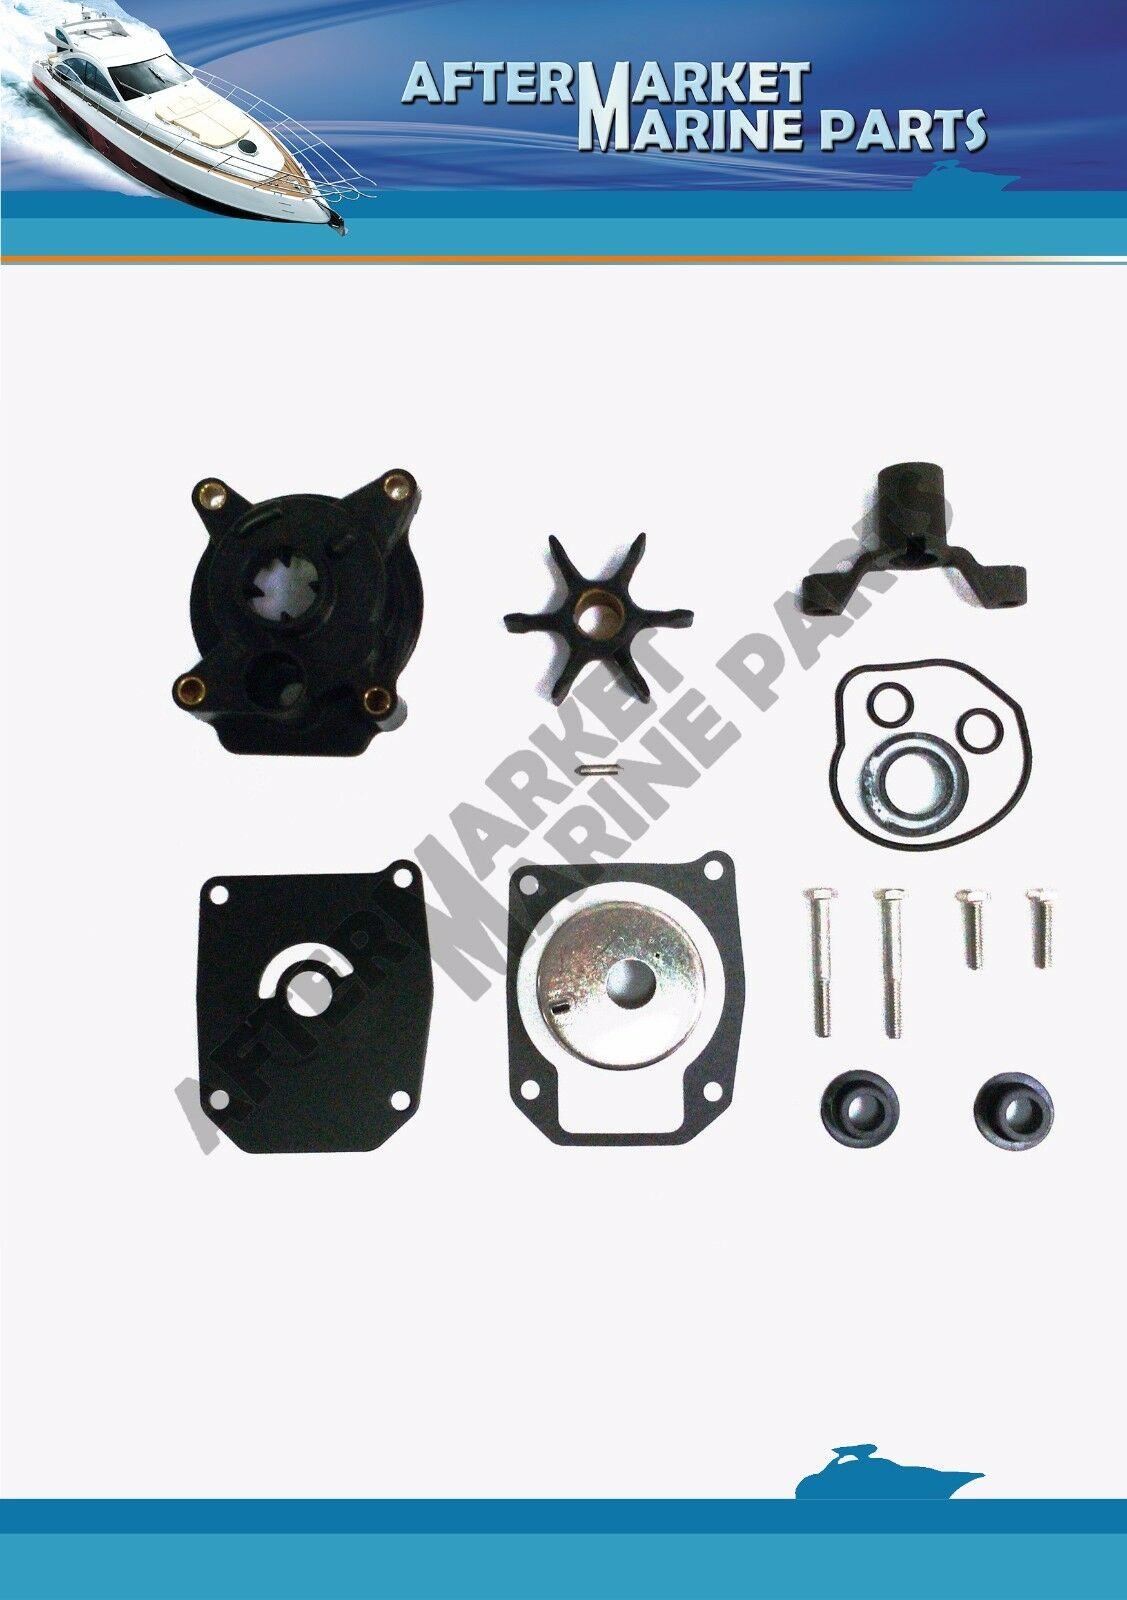 18-3378 439077 391635 Water Pump Impeller Kit Johnson Evinrude 50, 55, 60 HP